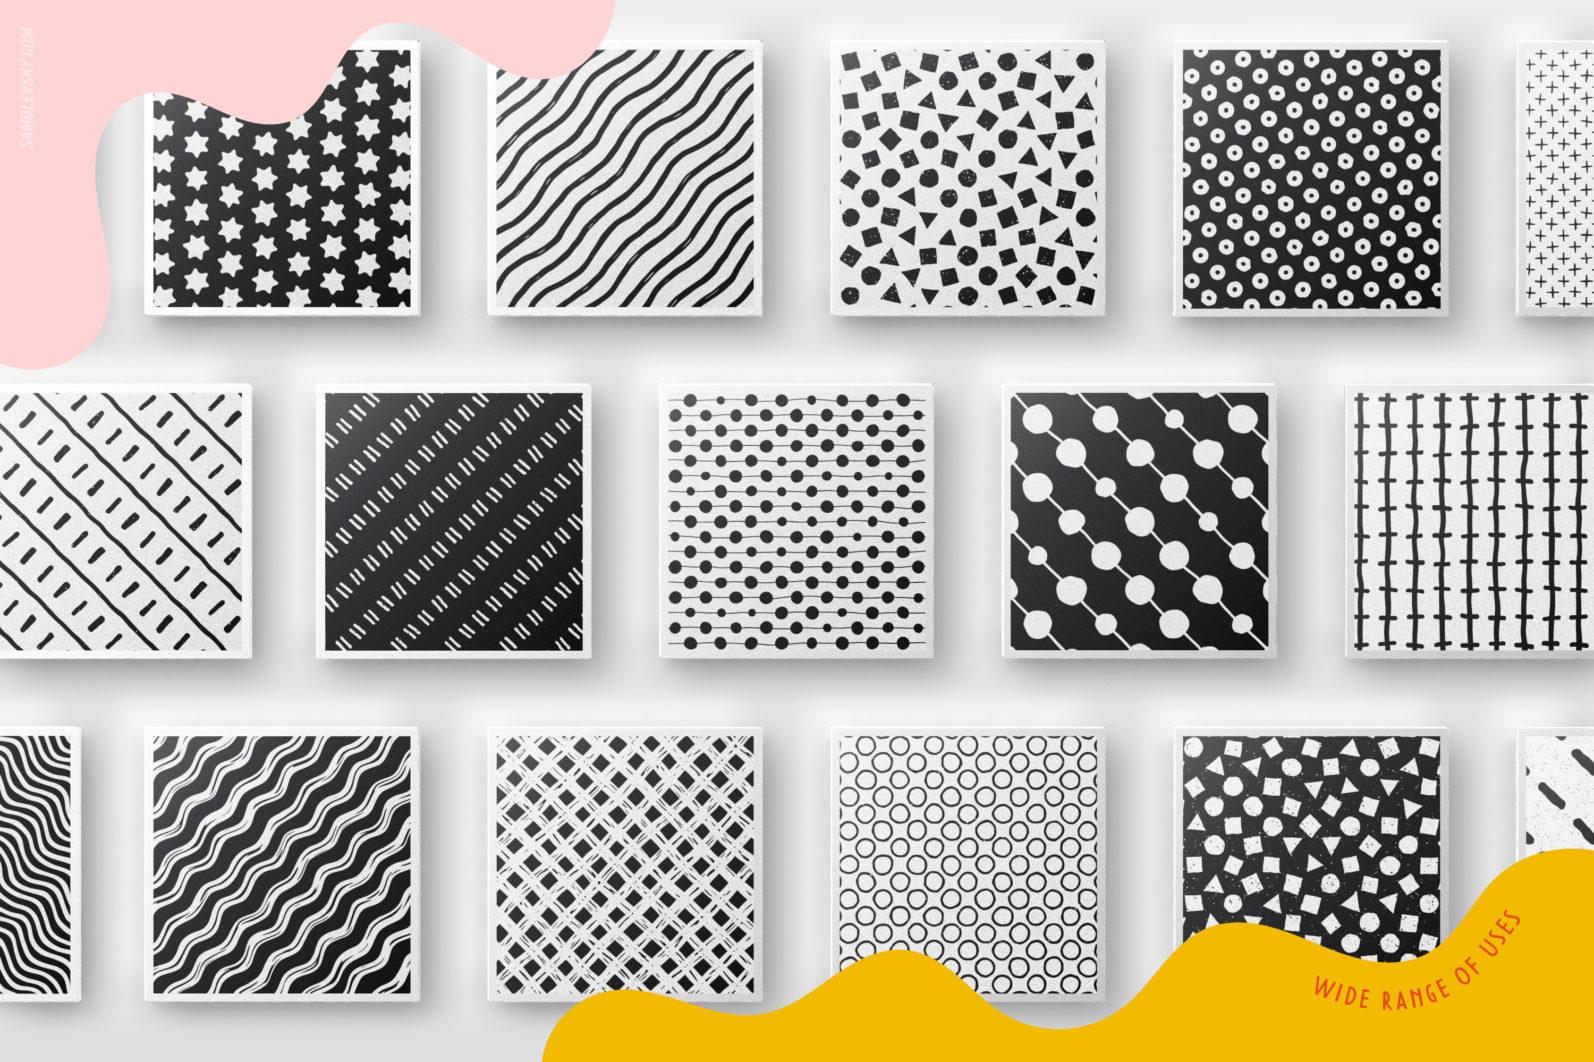 Handmade patterns bundle - 300 seamless patterns, brushes, and shapes - Samolevsky.com Handmade patterns bundle 14 scaled -